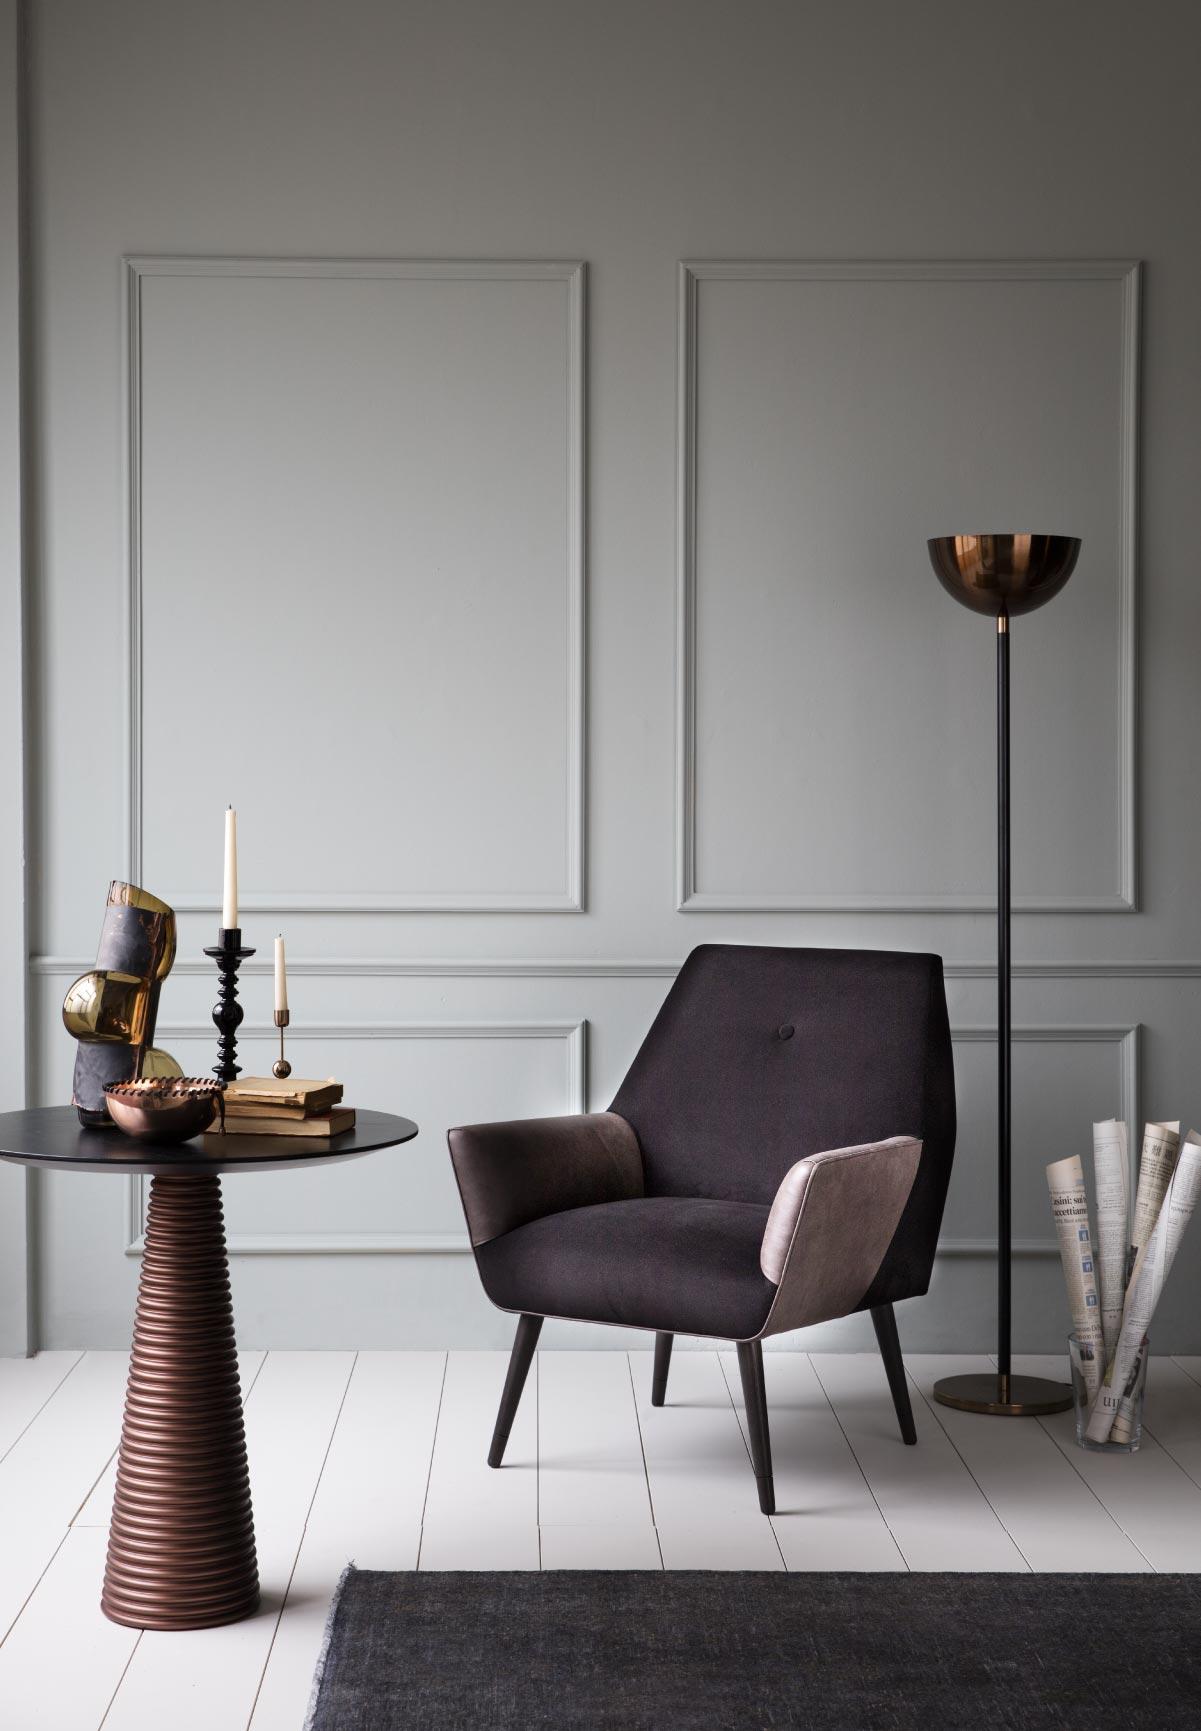 bouwebcollectionkadraj_circle coffee table-basic lamp- nero armchair